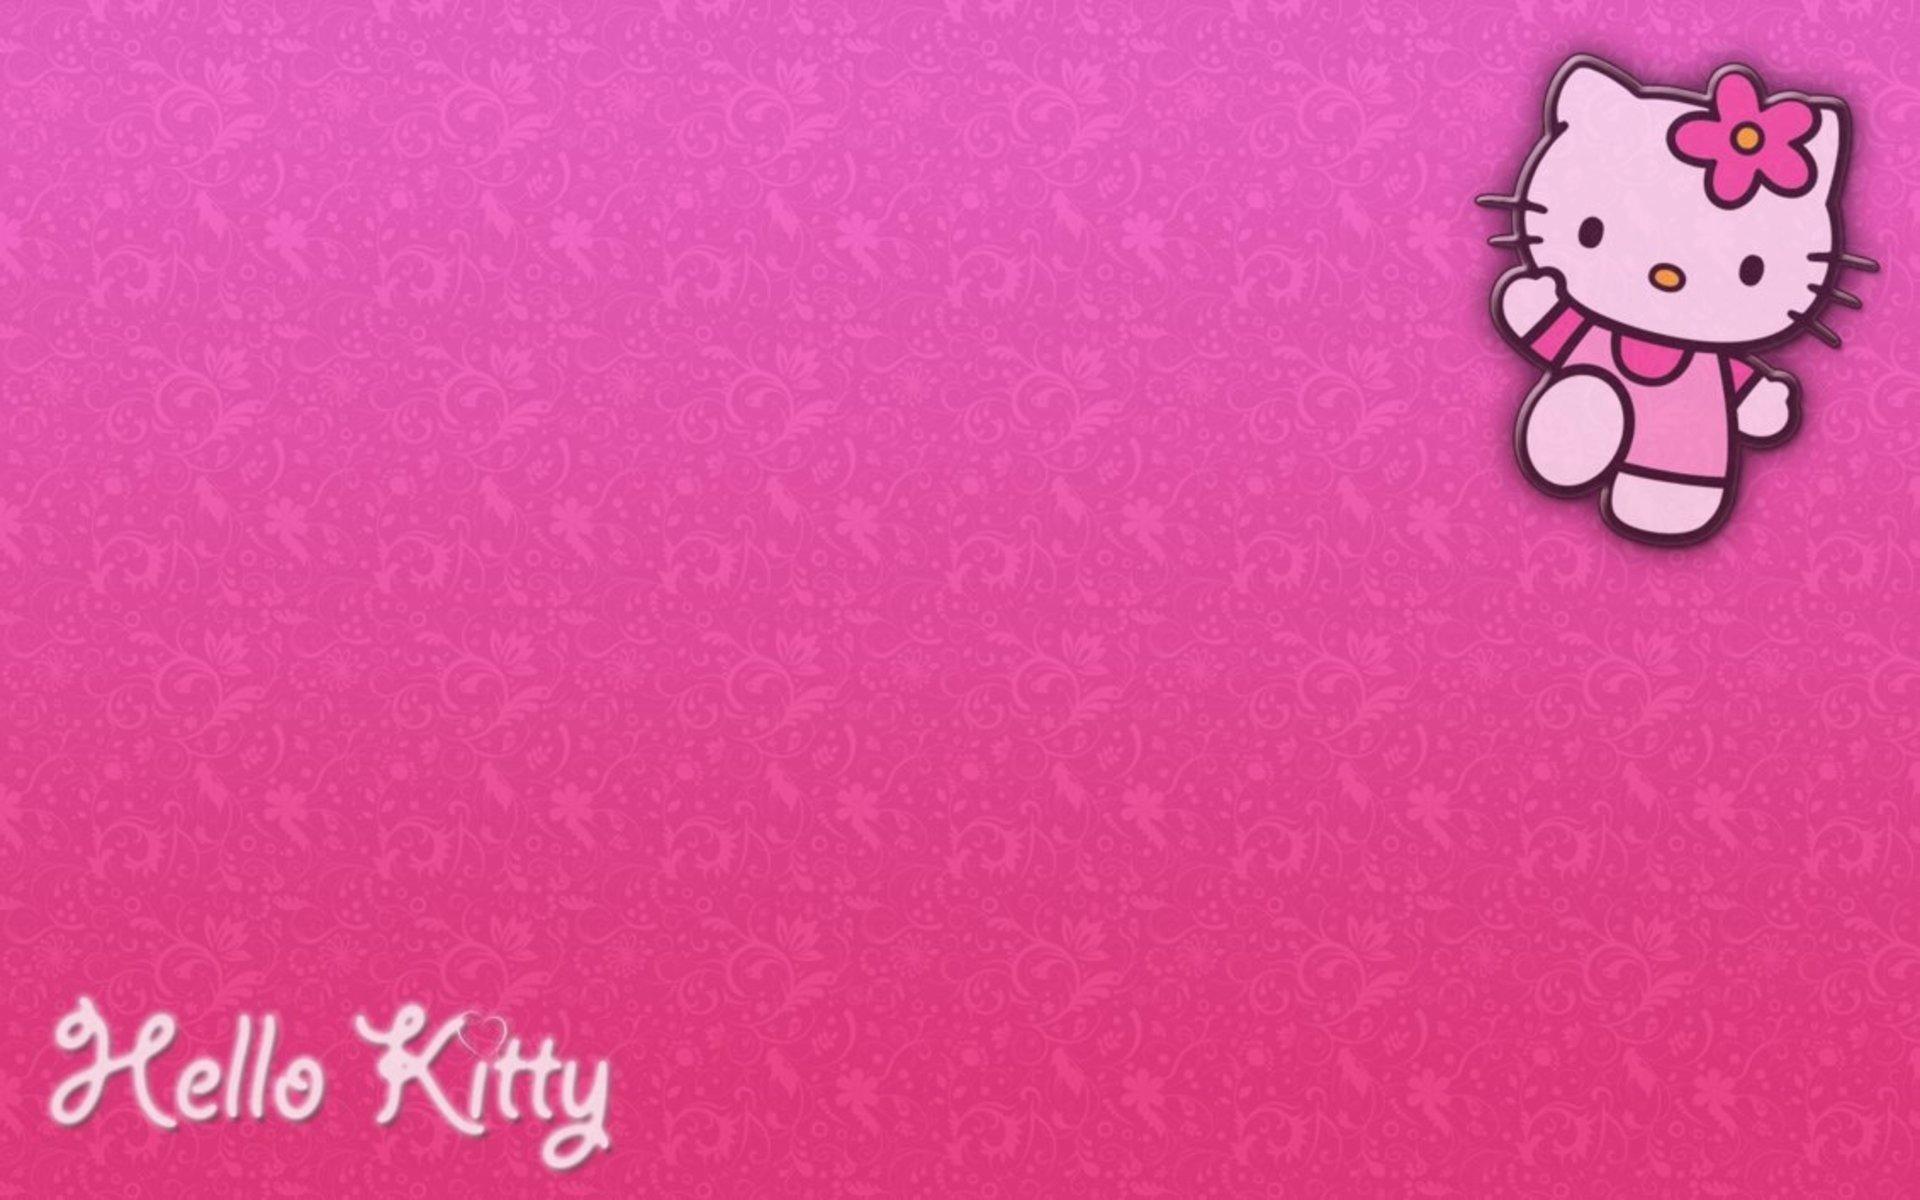 wallpaper.wiki-Hello-kitty-wallpaper-desktop-picture-pictures-